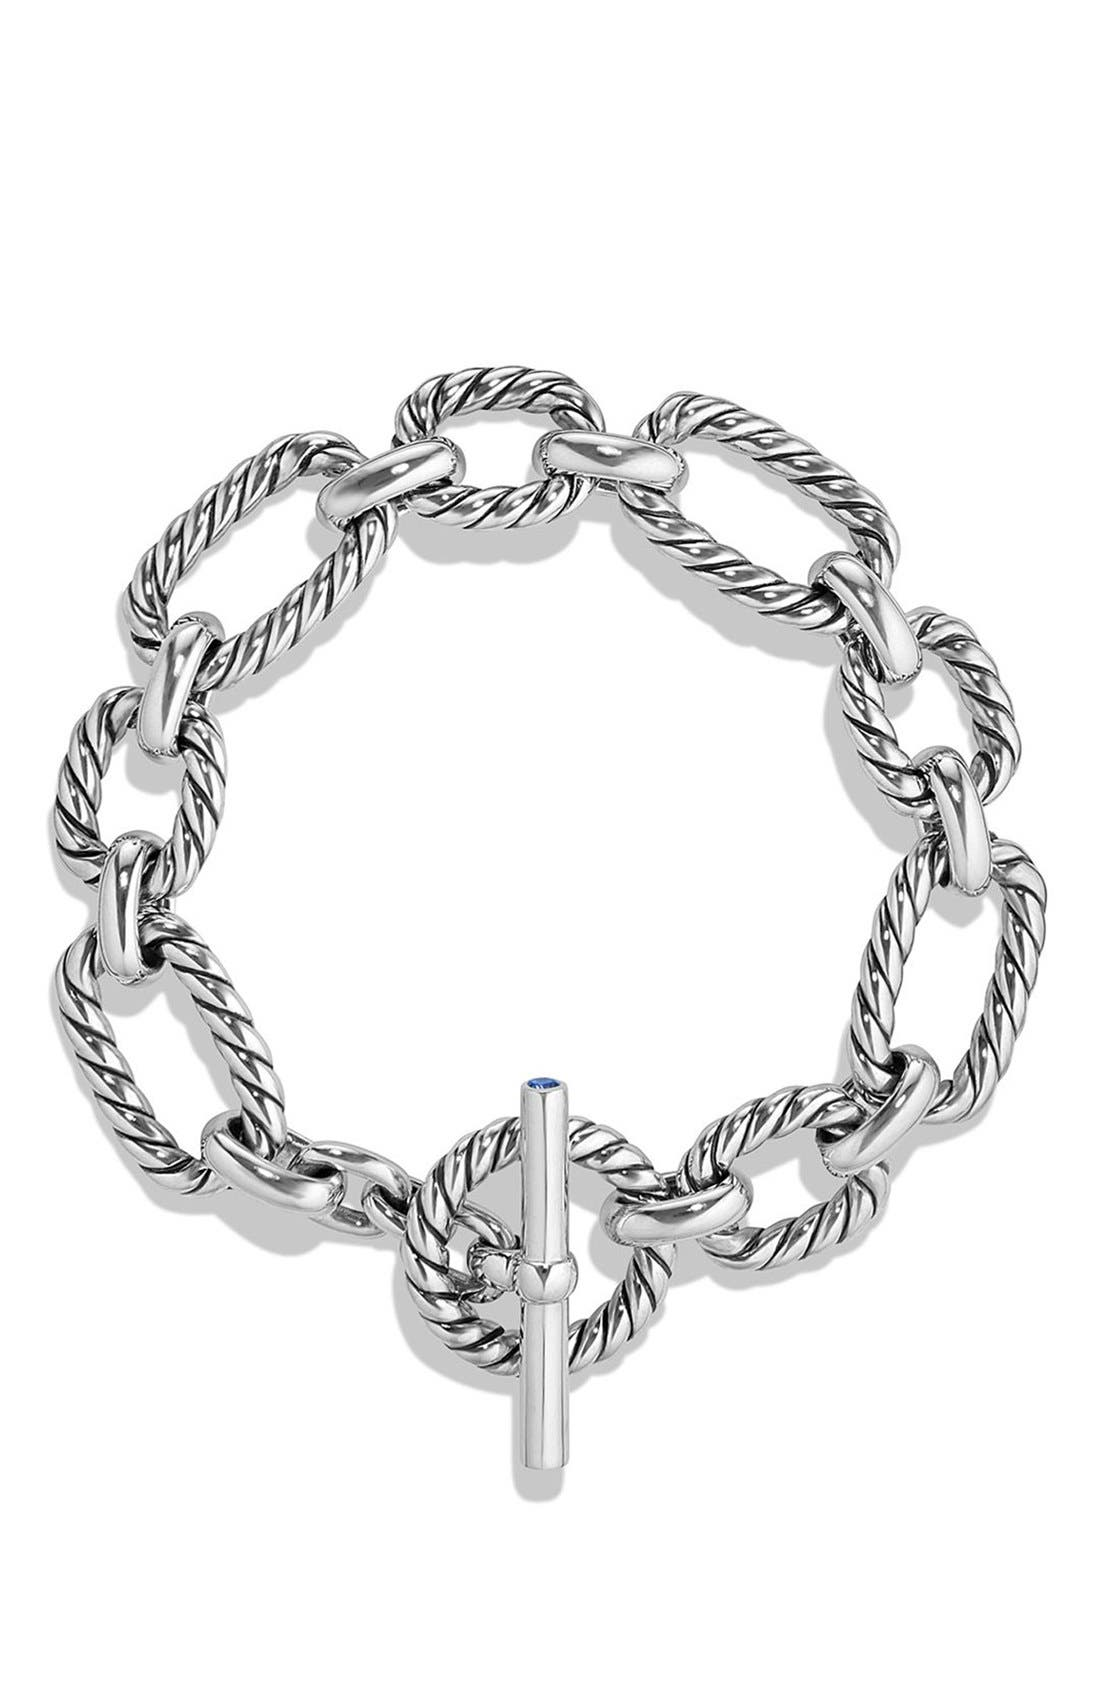 DAVID YURMAN, 'Chain' Cushion Link Bracelet with Blue Sapphires, Alternate thumbnail 3, color, SILVER/ BLUE SAPPHIRE